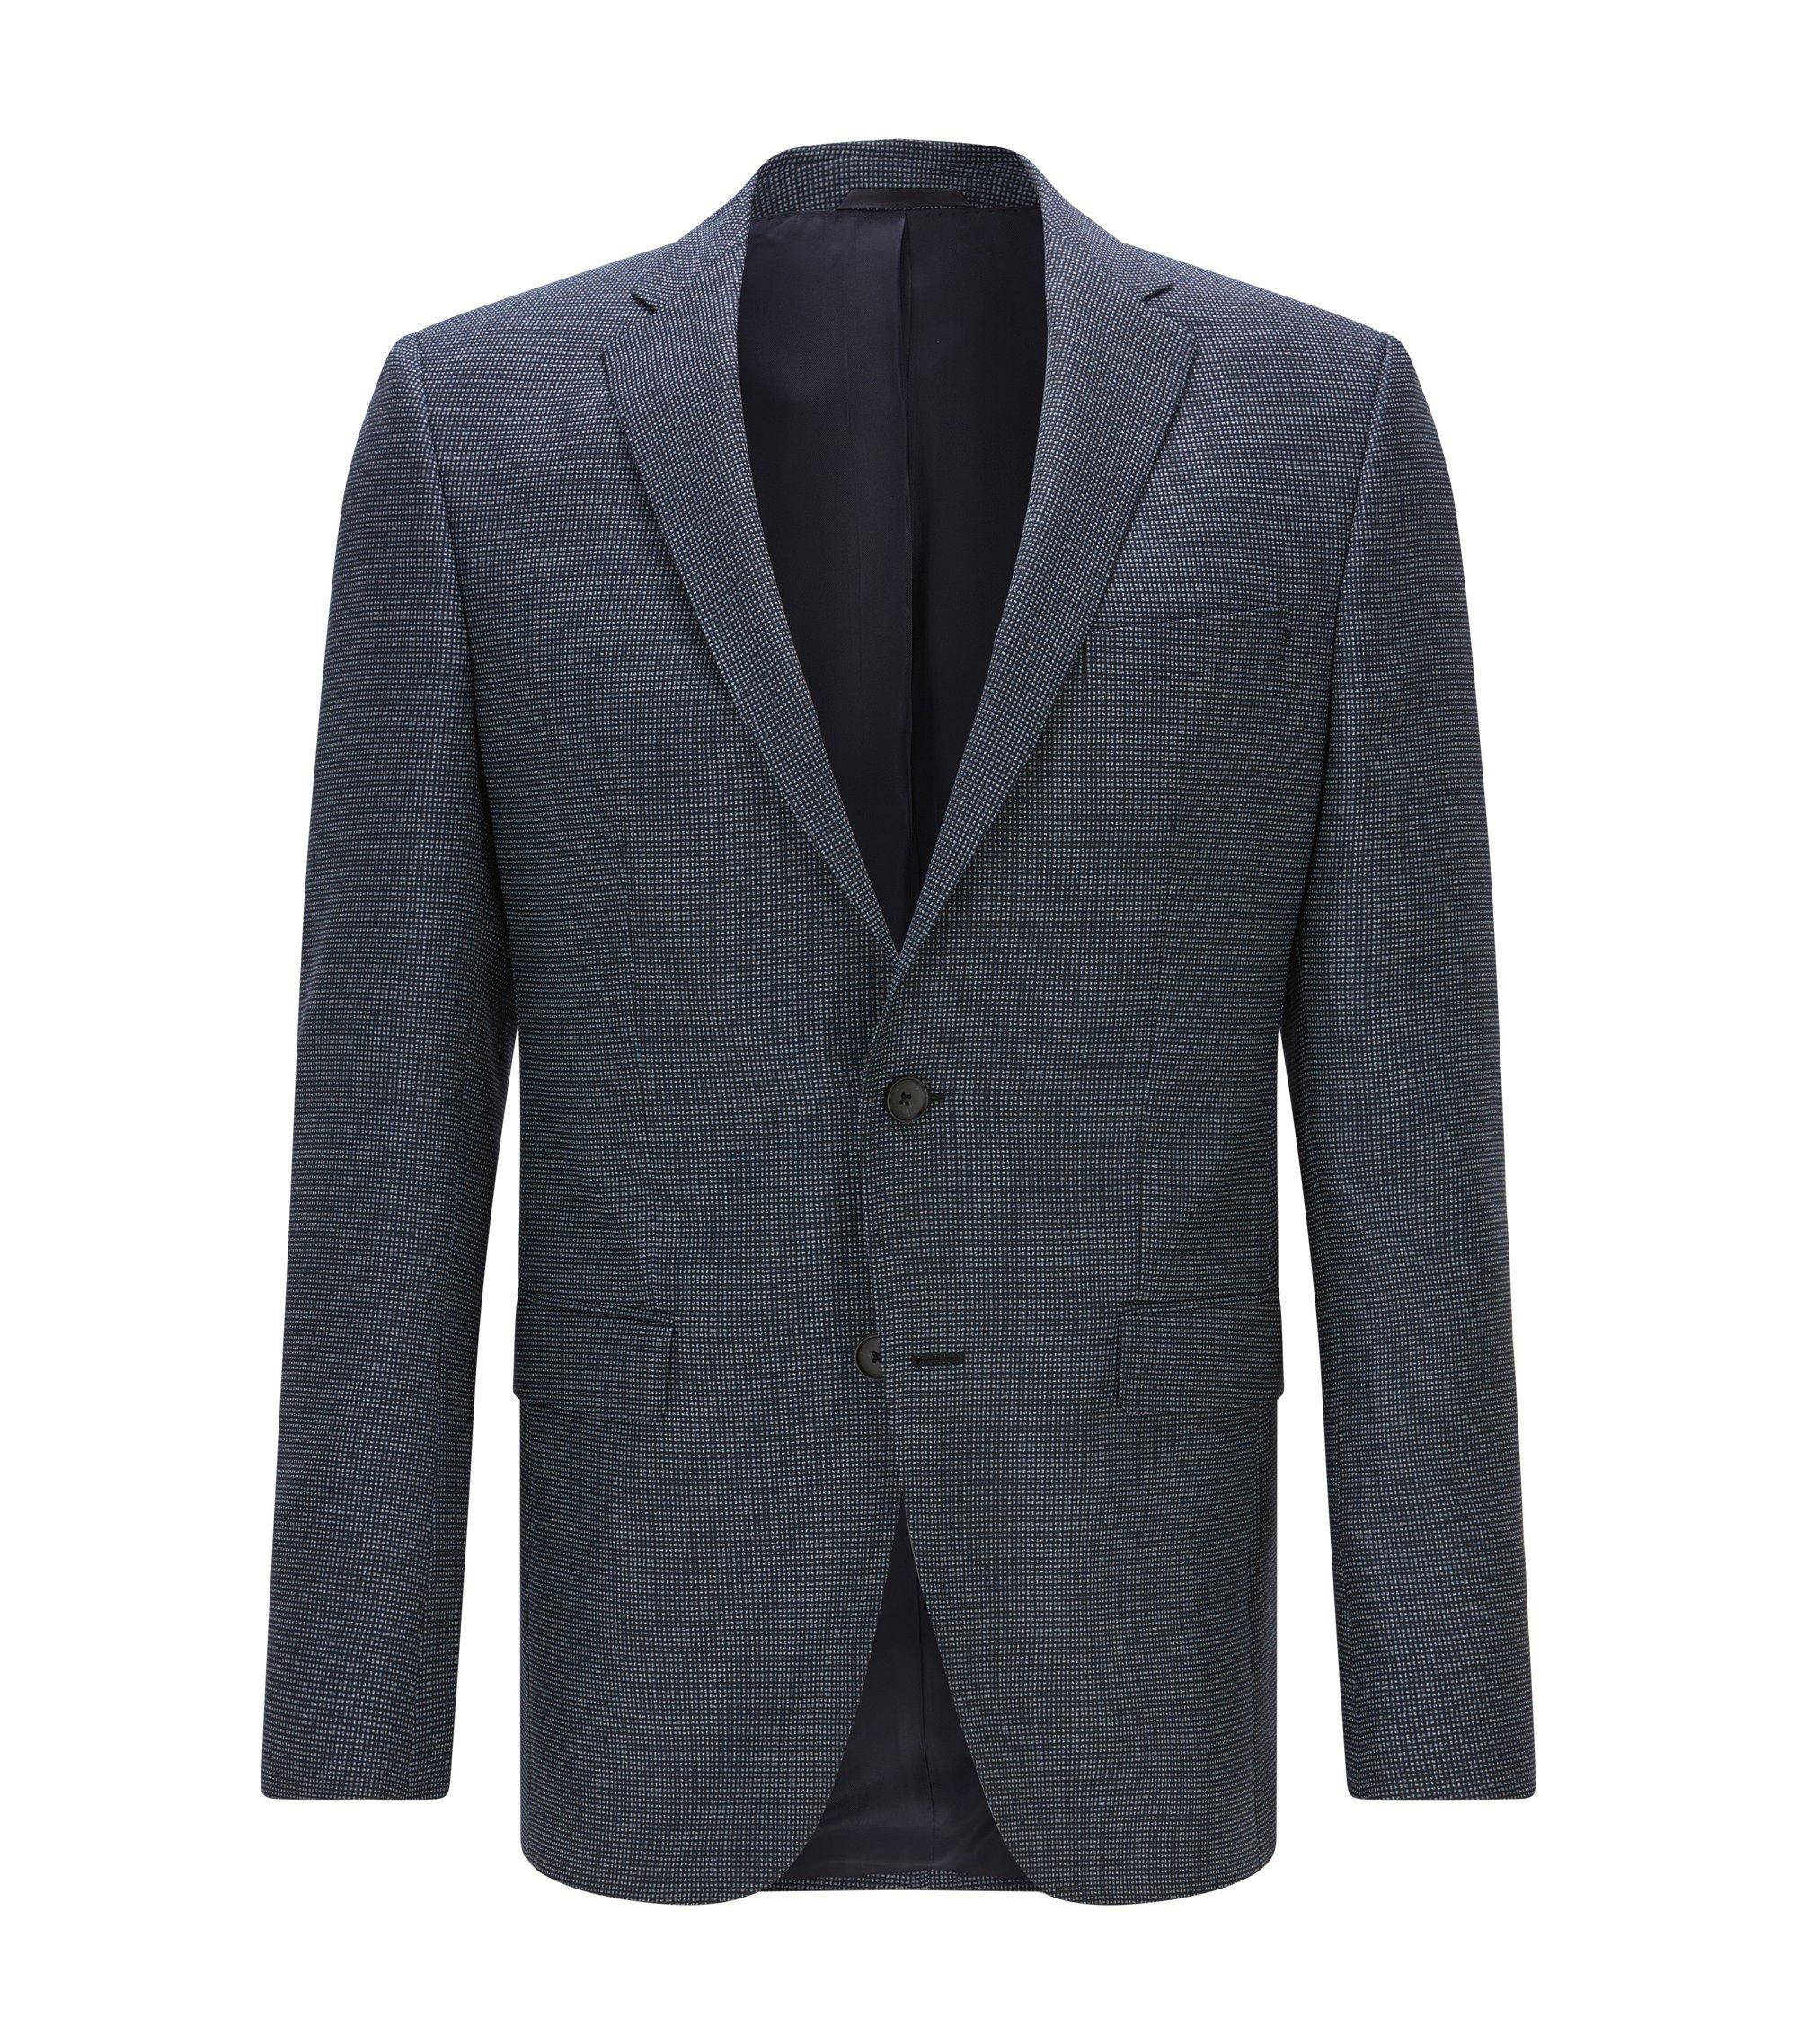 Giacca slim fit in lana vergine con toppe sui gomiti, Blu scuro